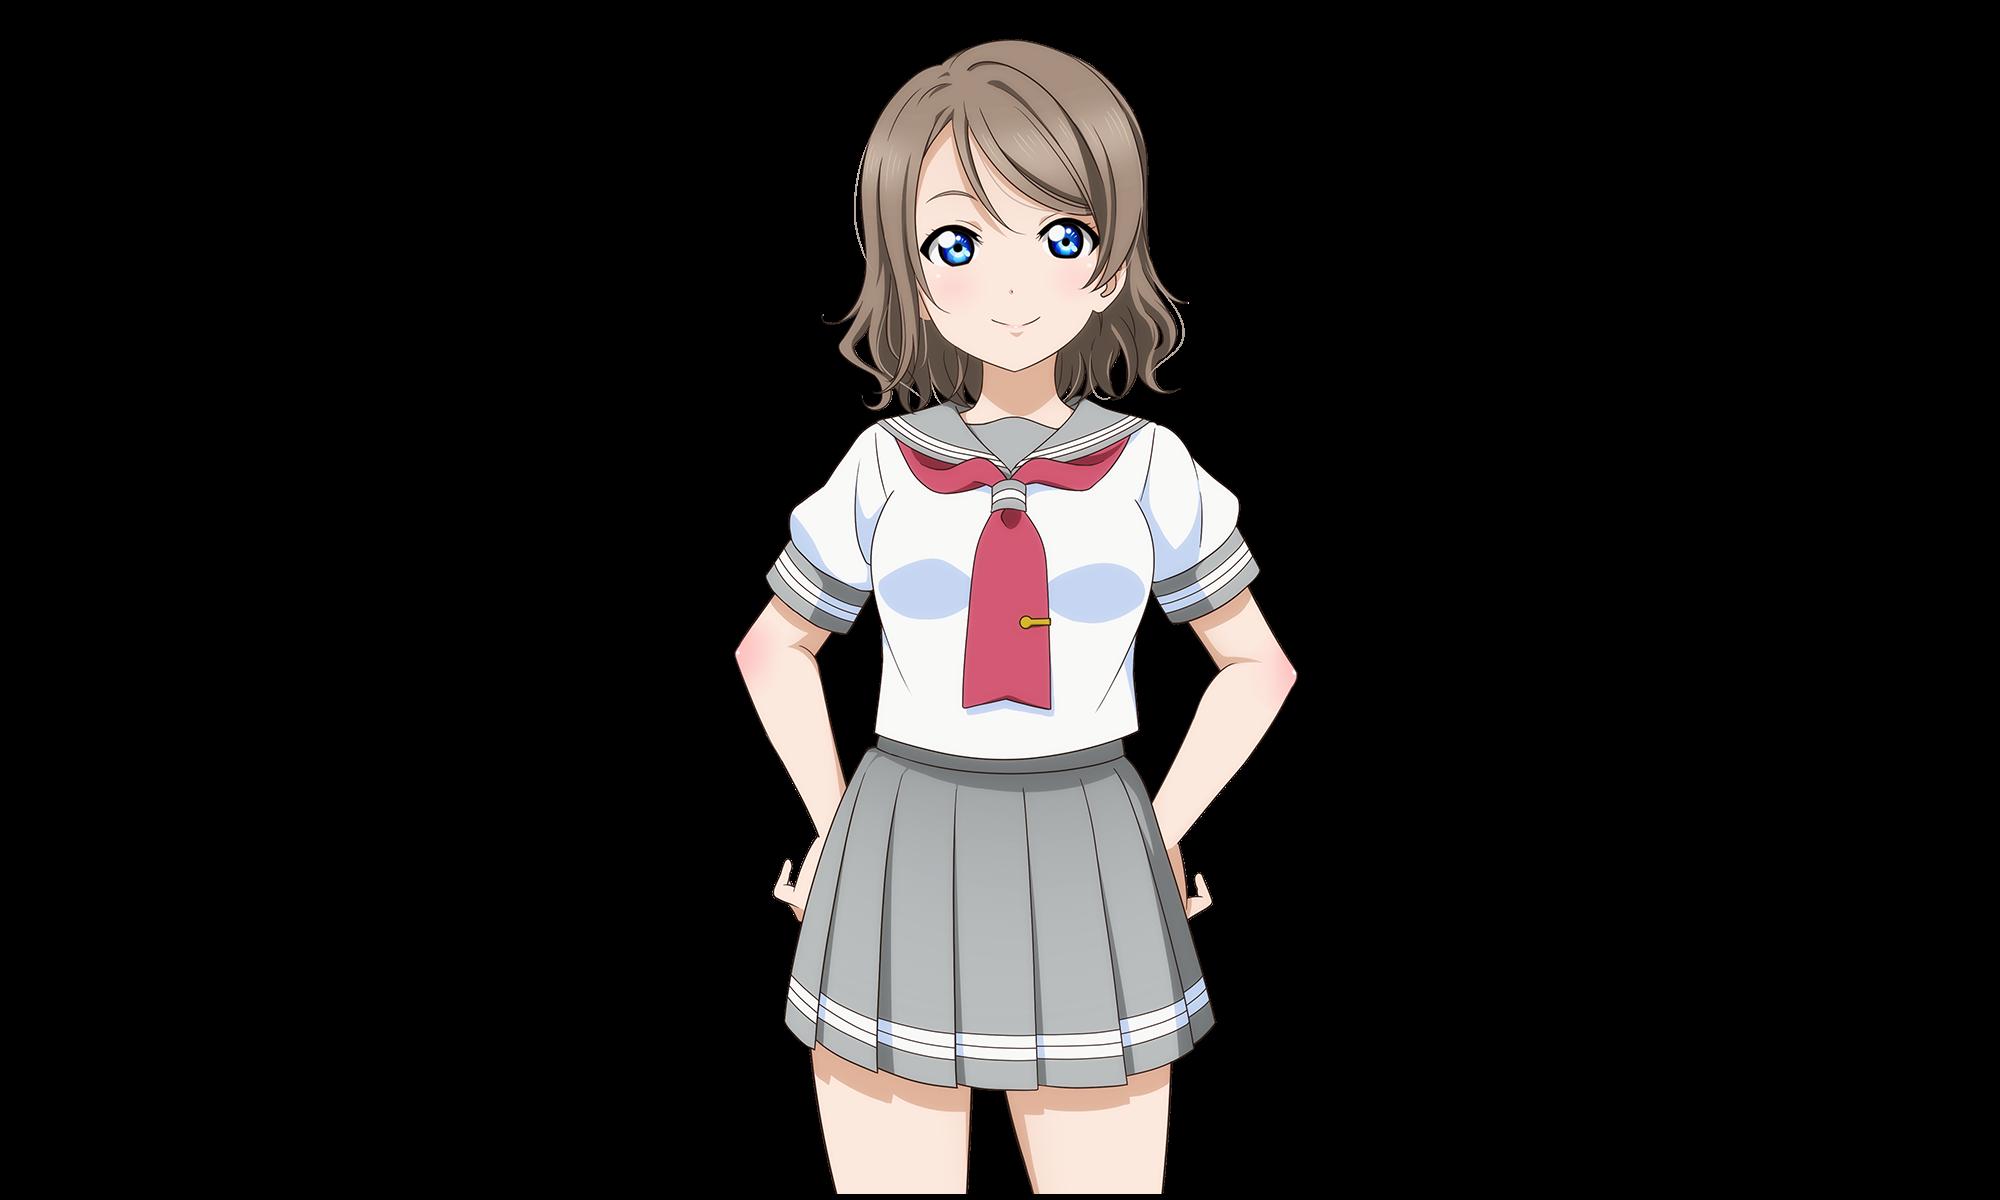 Watanabe You Idols List Love Live Idol Story Love Live .and so watanabe you, will now set sail for love live! watanabe you idols list love live